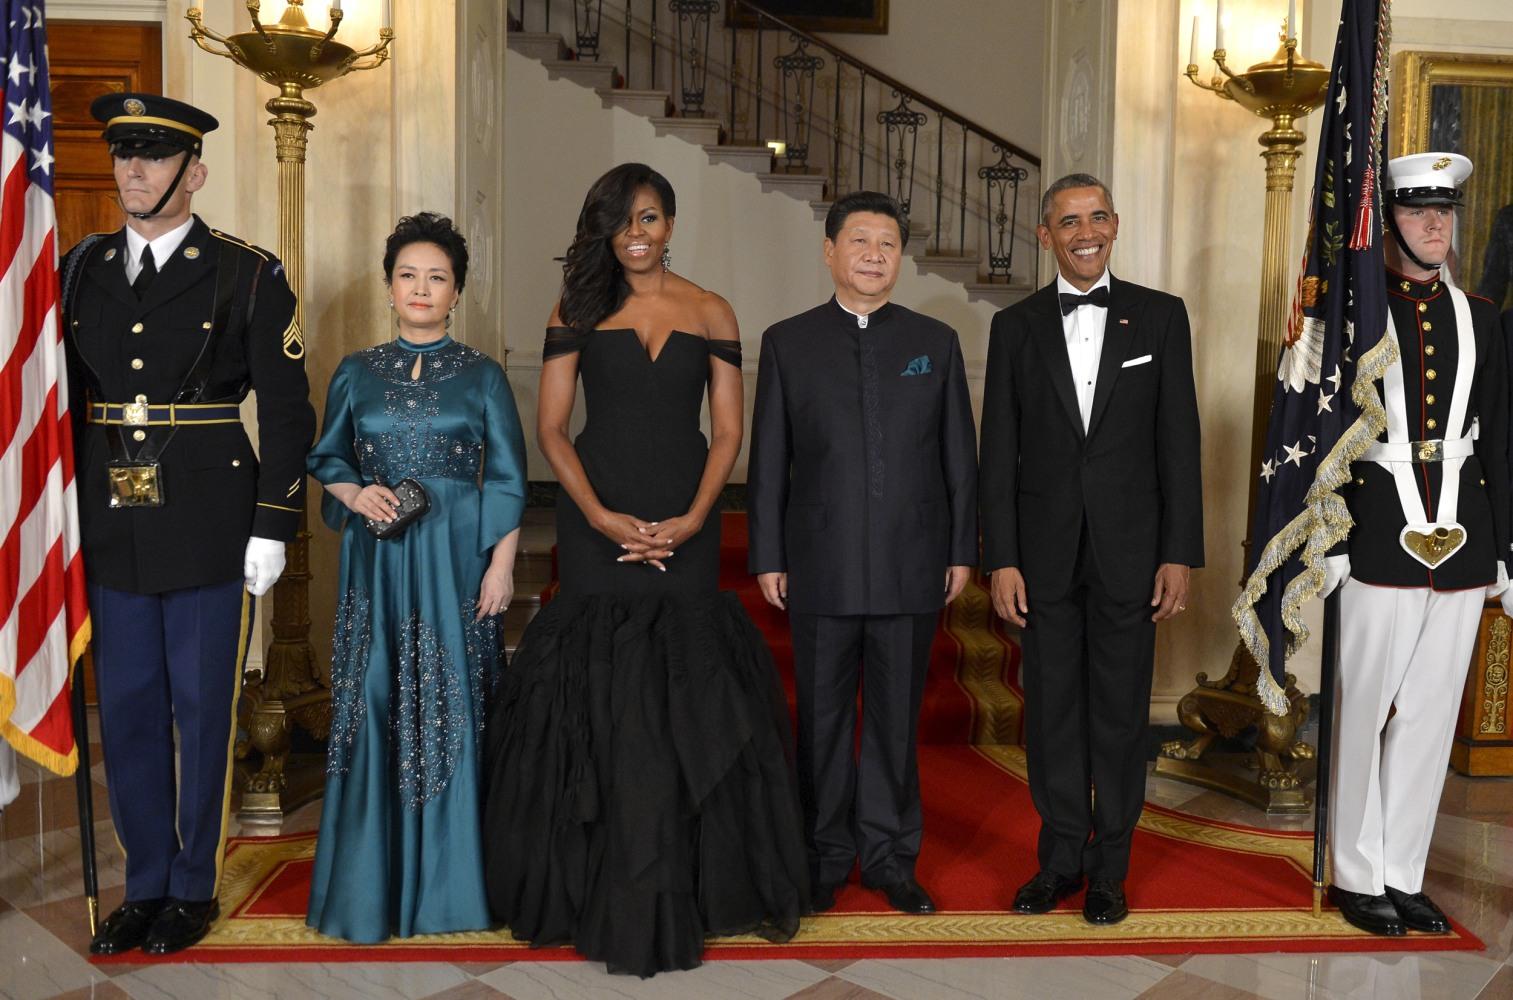 170106-michelle-obama-china-_state-dinner-vera-wang-ok-1452_f95b0b2ab80a3f0f51edb2ee72b1906e.nbcnews-ux-2880-1000.jpg